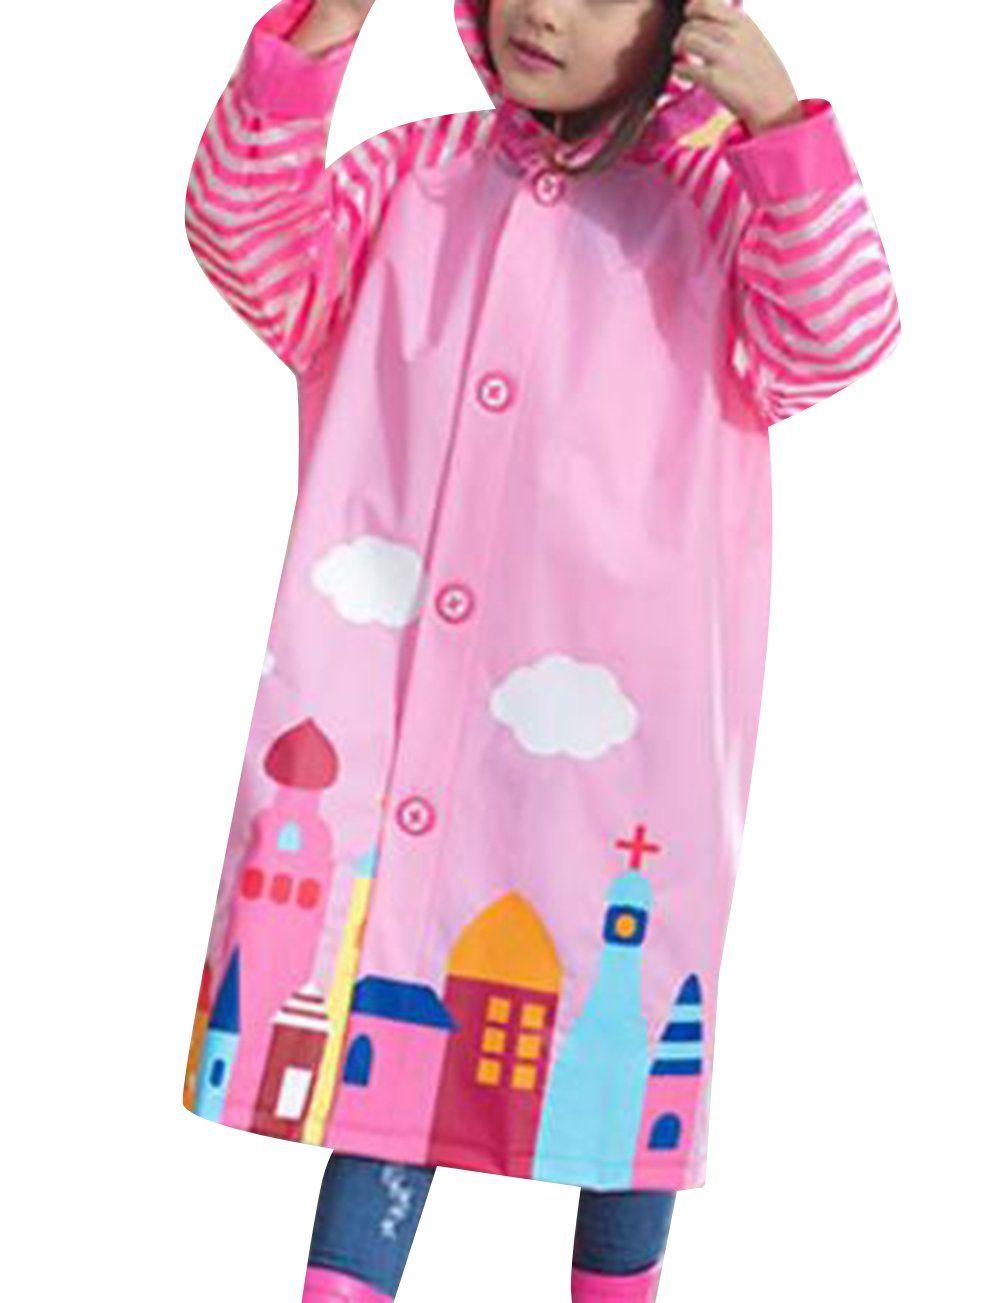 e11ab9689650 TRENDY XU Unisex Childern Kids Cartoon Raincoat Hooded Rain Jacket ...